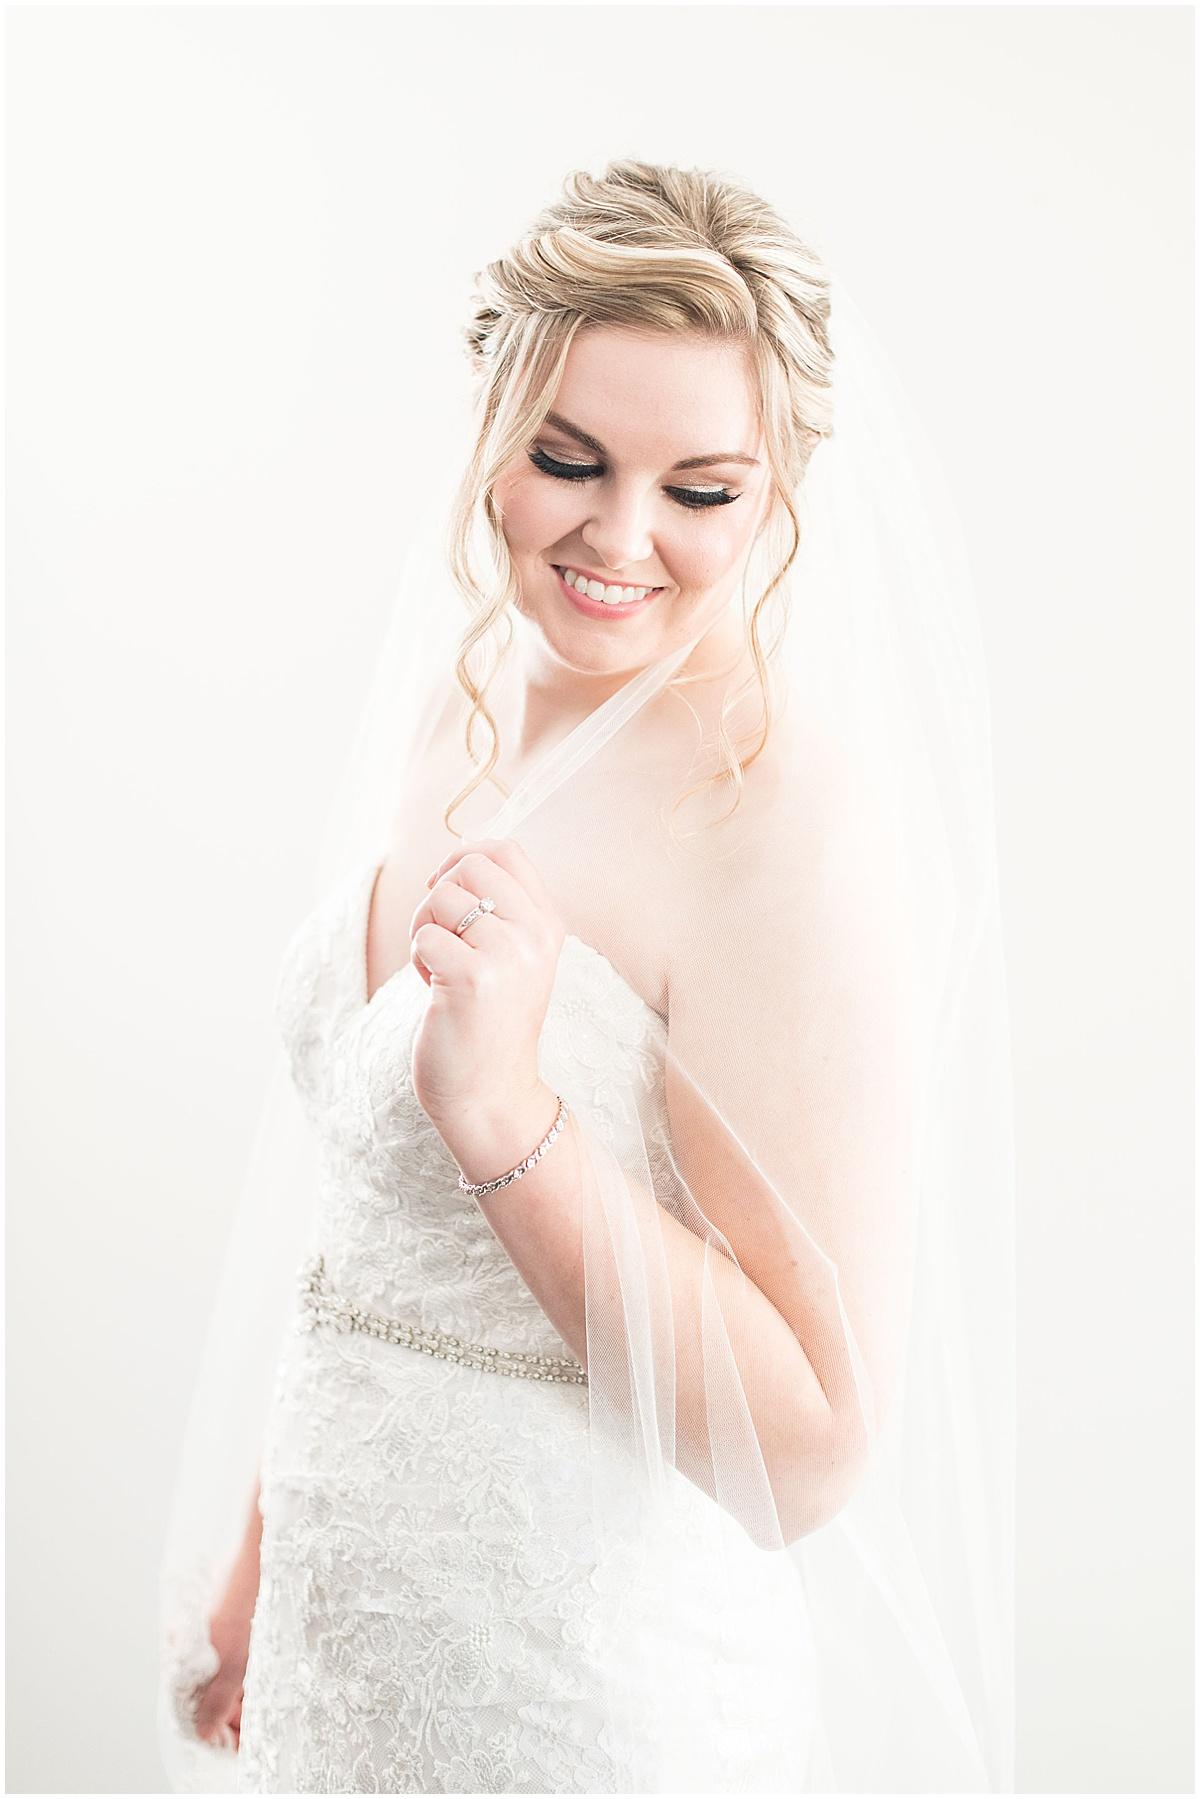 Bridal portrait before Cornerstone Christian Church wedding in Brownsburg, Indiana by Victoria Rayburn Photography